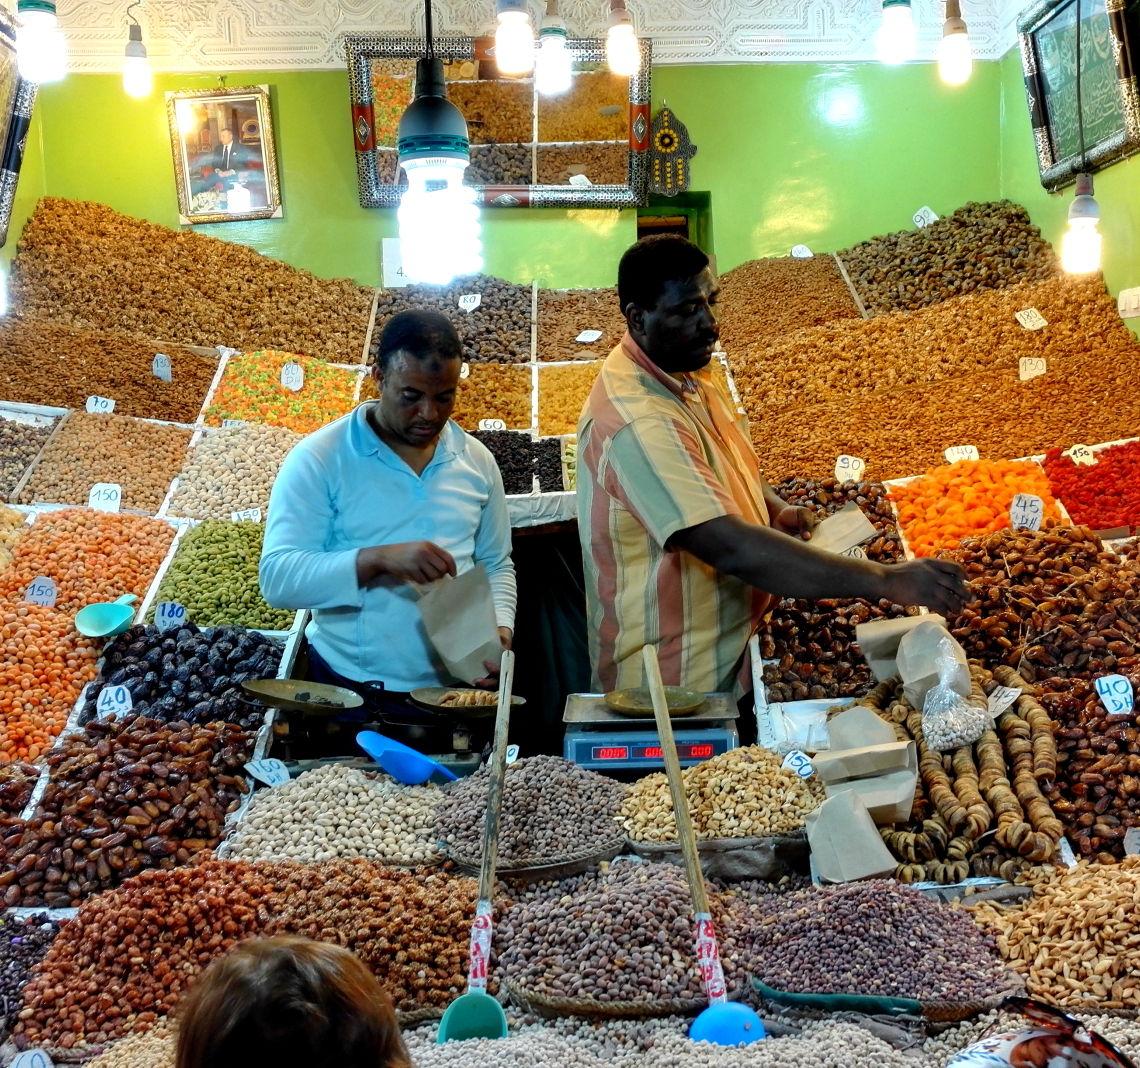 Marokkanische Nüsse